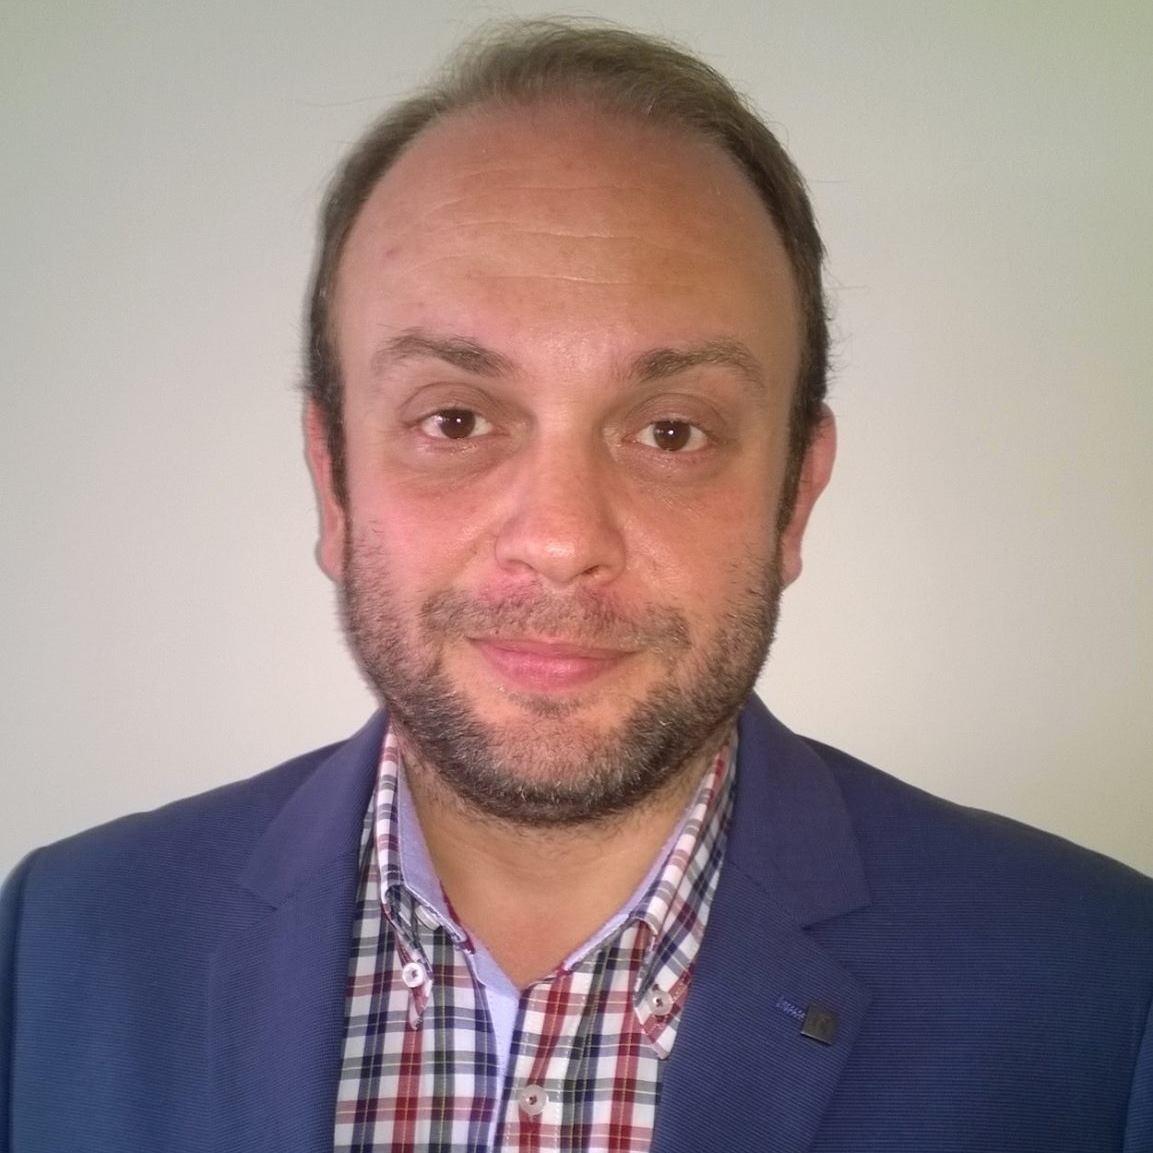 kozan.gr: Χύτρα Ειδήσεων: Πρόταση για την ΔΕΗ επεξεργάζεται και θα παρουσιάσει, λίαν προσεχώς, ο εξ Εορδαίας, Γραμματέας Ενέργειας & Περιβάλλοντος των ΑΝΕΛ, Χρήστος Ιωάννου